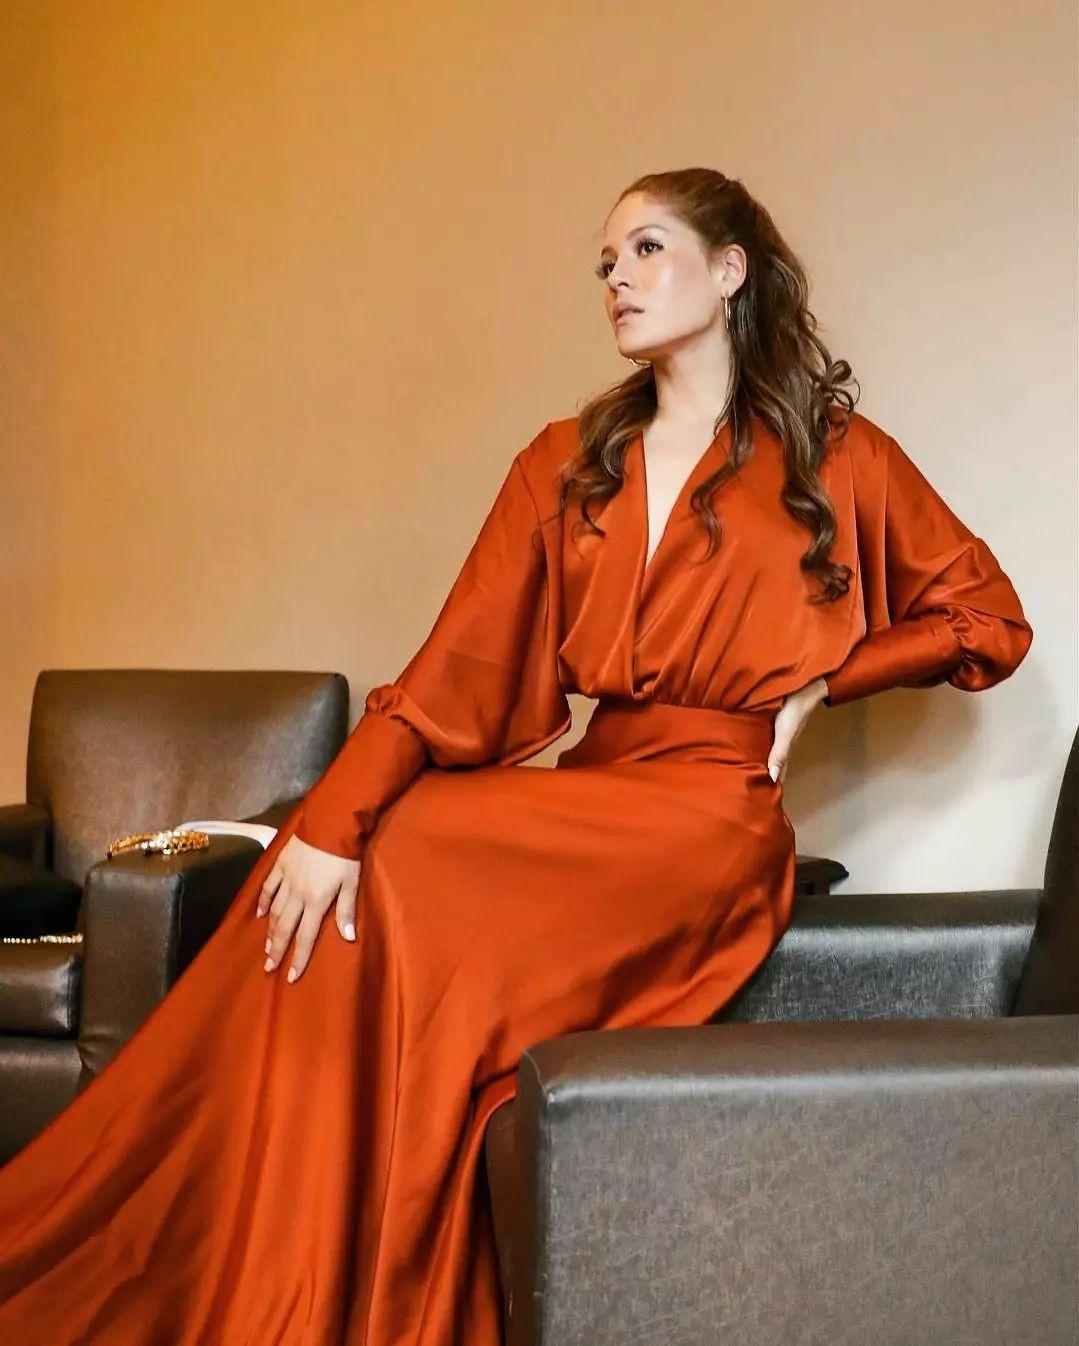 candidatas a miss universe colombia 2021. final: 18 oct. sede: neiva. - Página 23 5fGgix